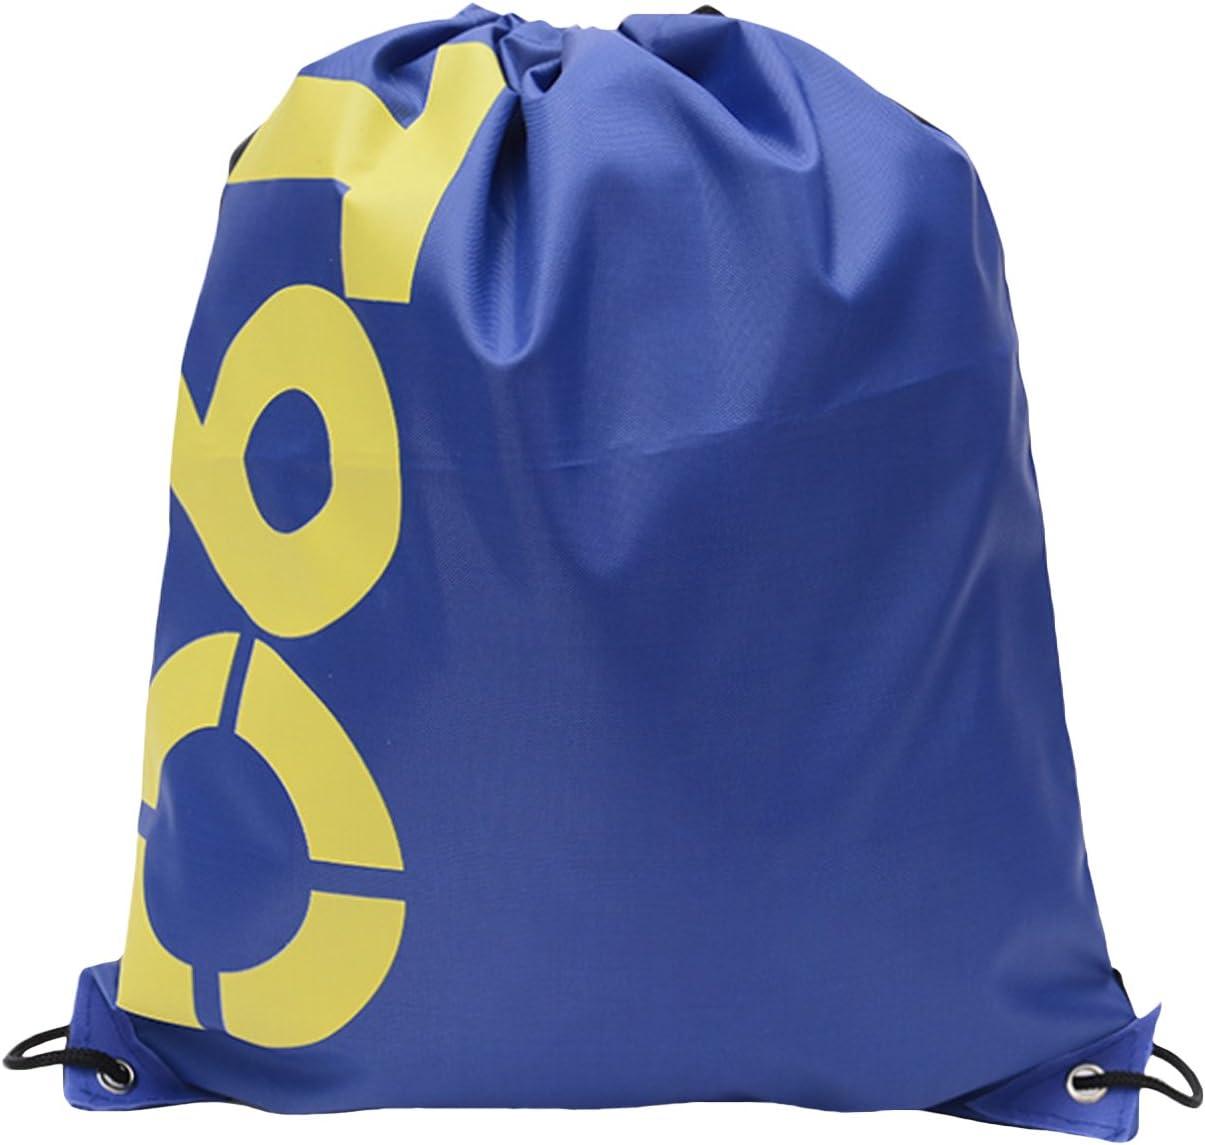 Bestgift Choice Drawstring Bag Lightweight Convenient Attention brand Waterproof